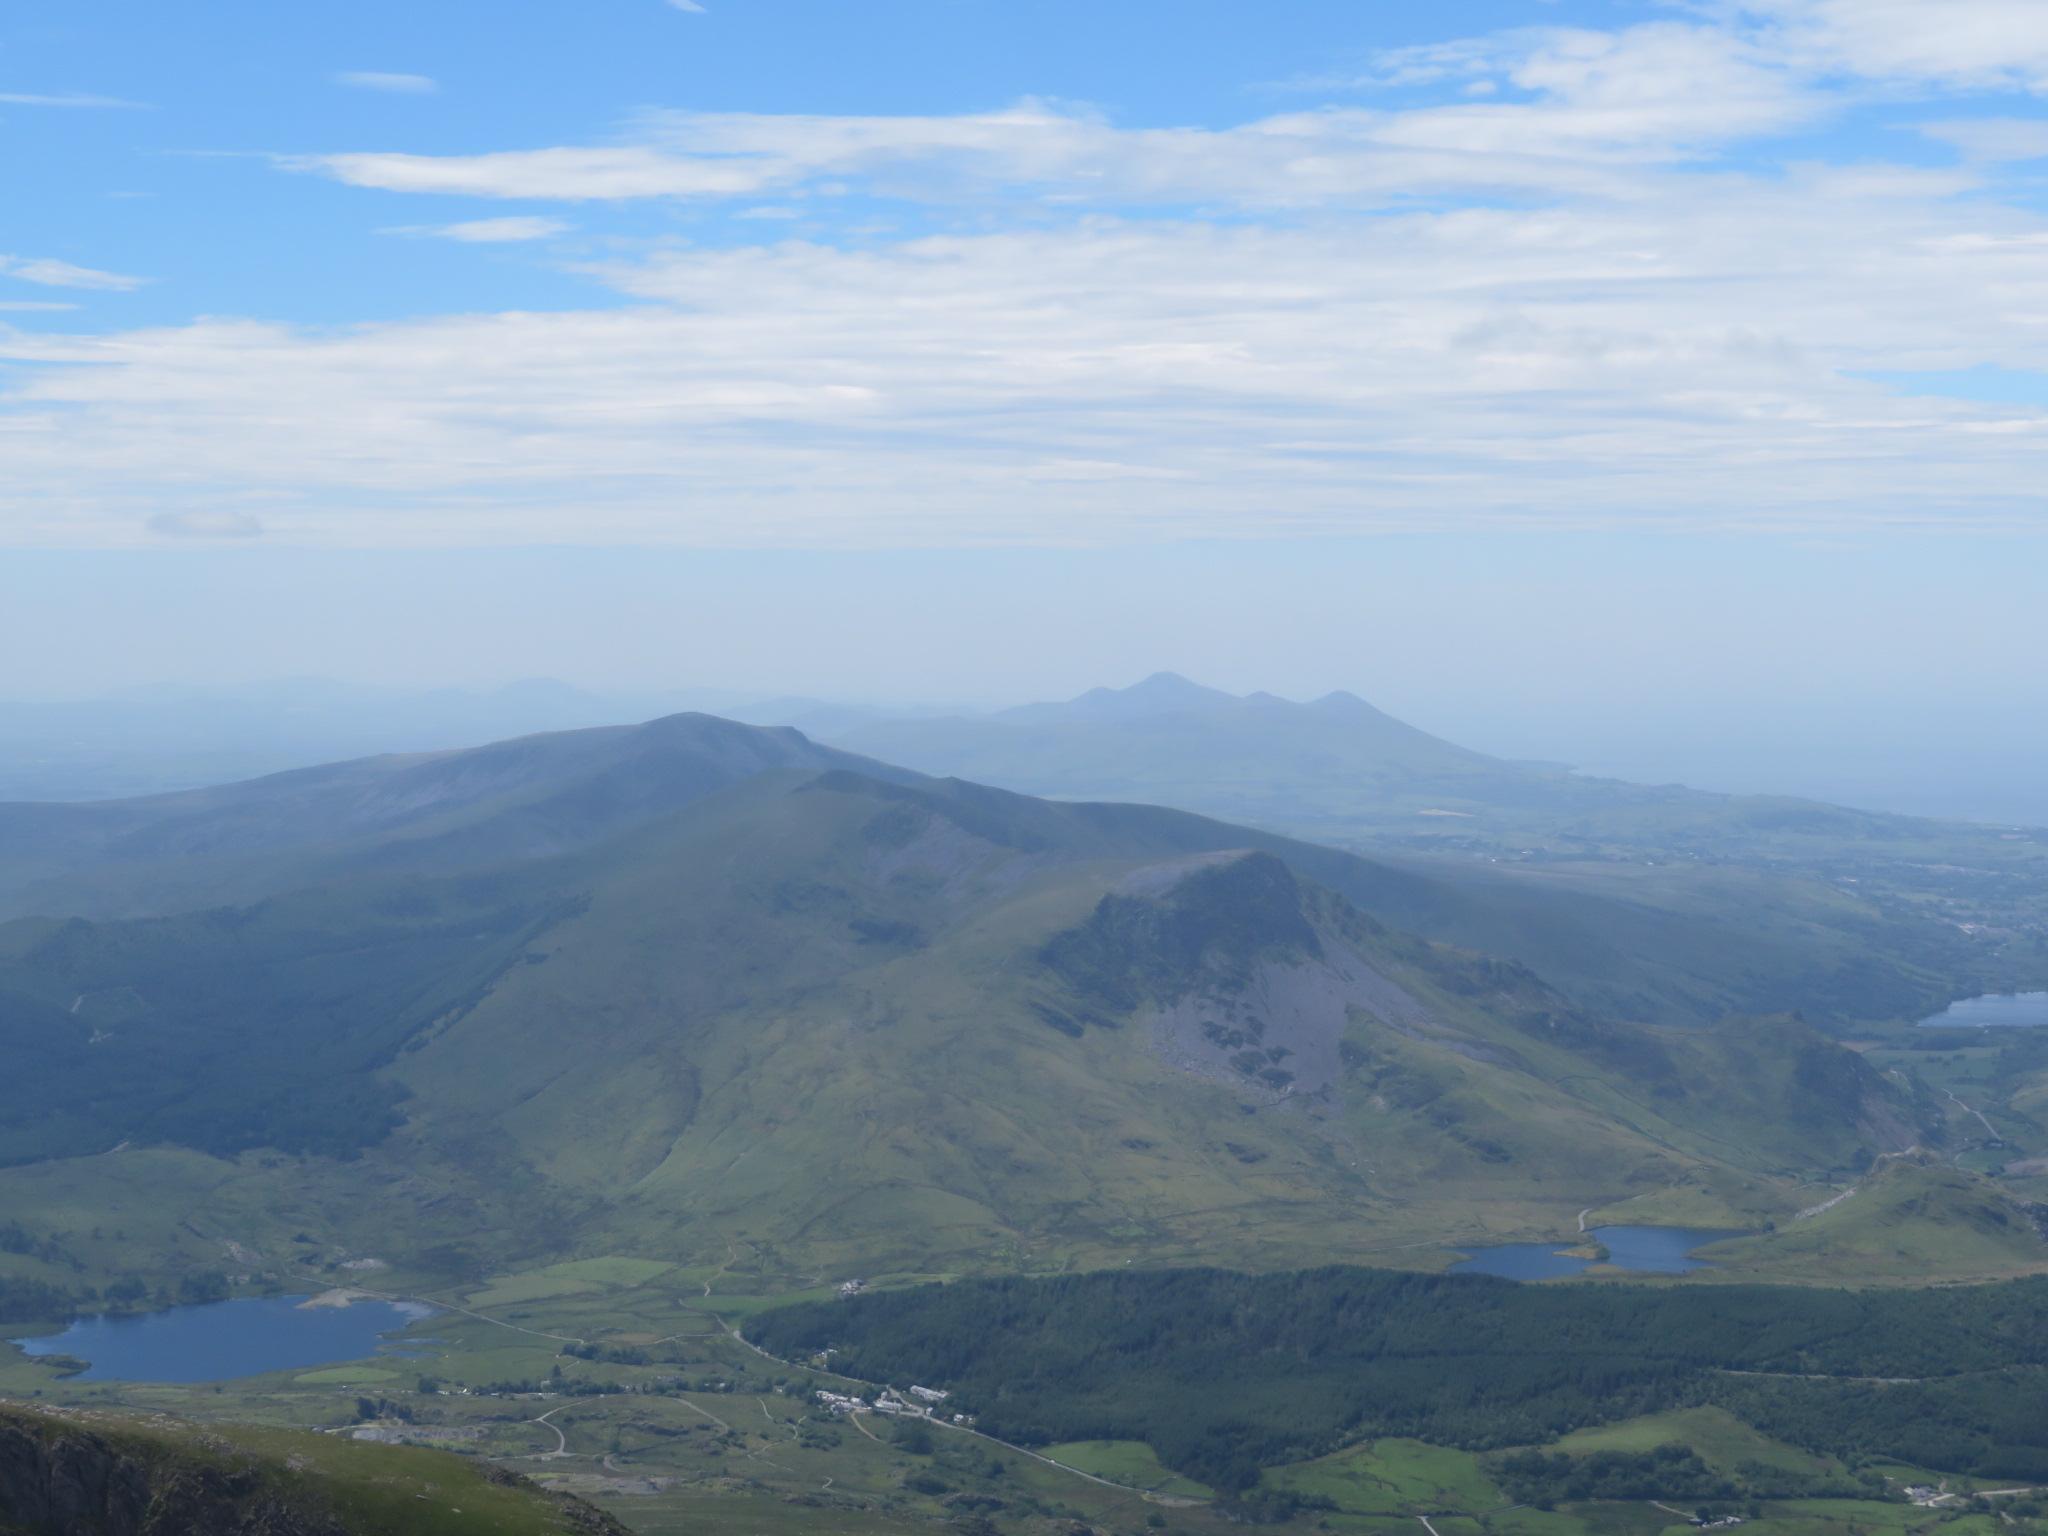 United Kingdom Wales Snowdonia, Snowdon Horseshoe, Nantille Ridge, west from Snowdon, Walkopedia